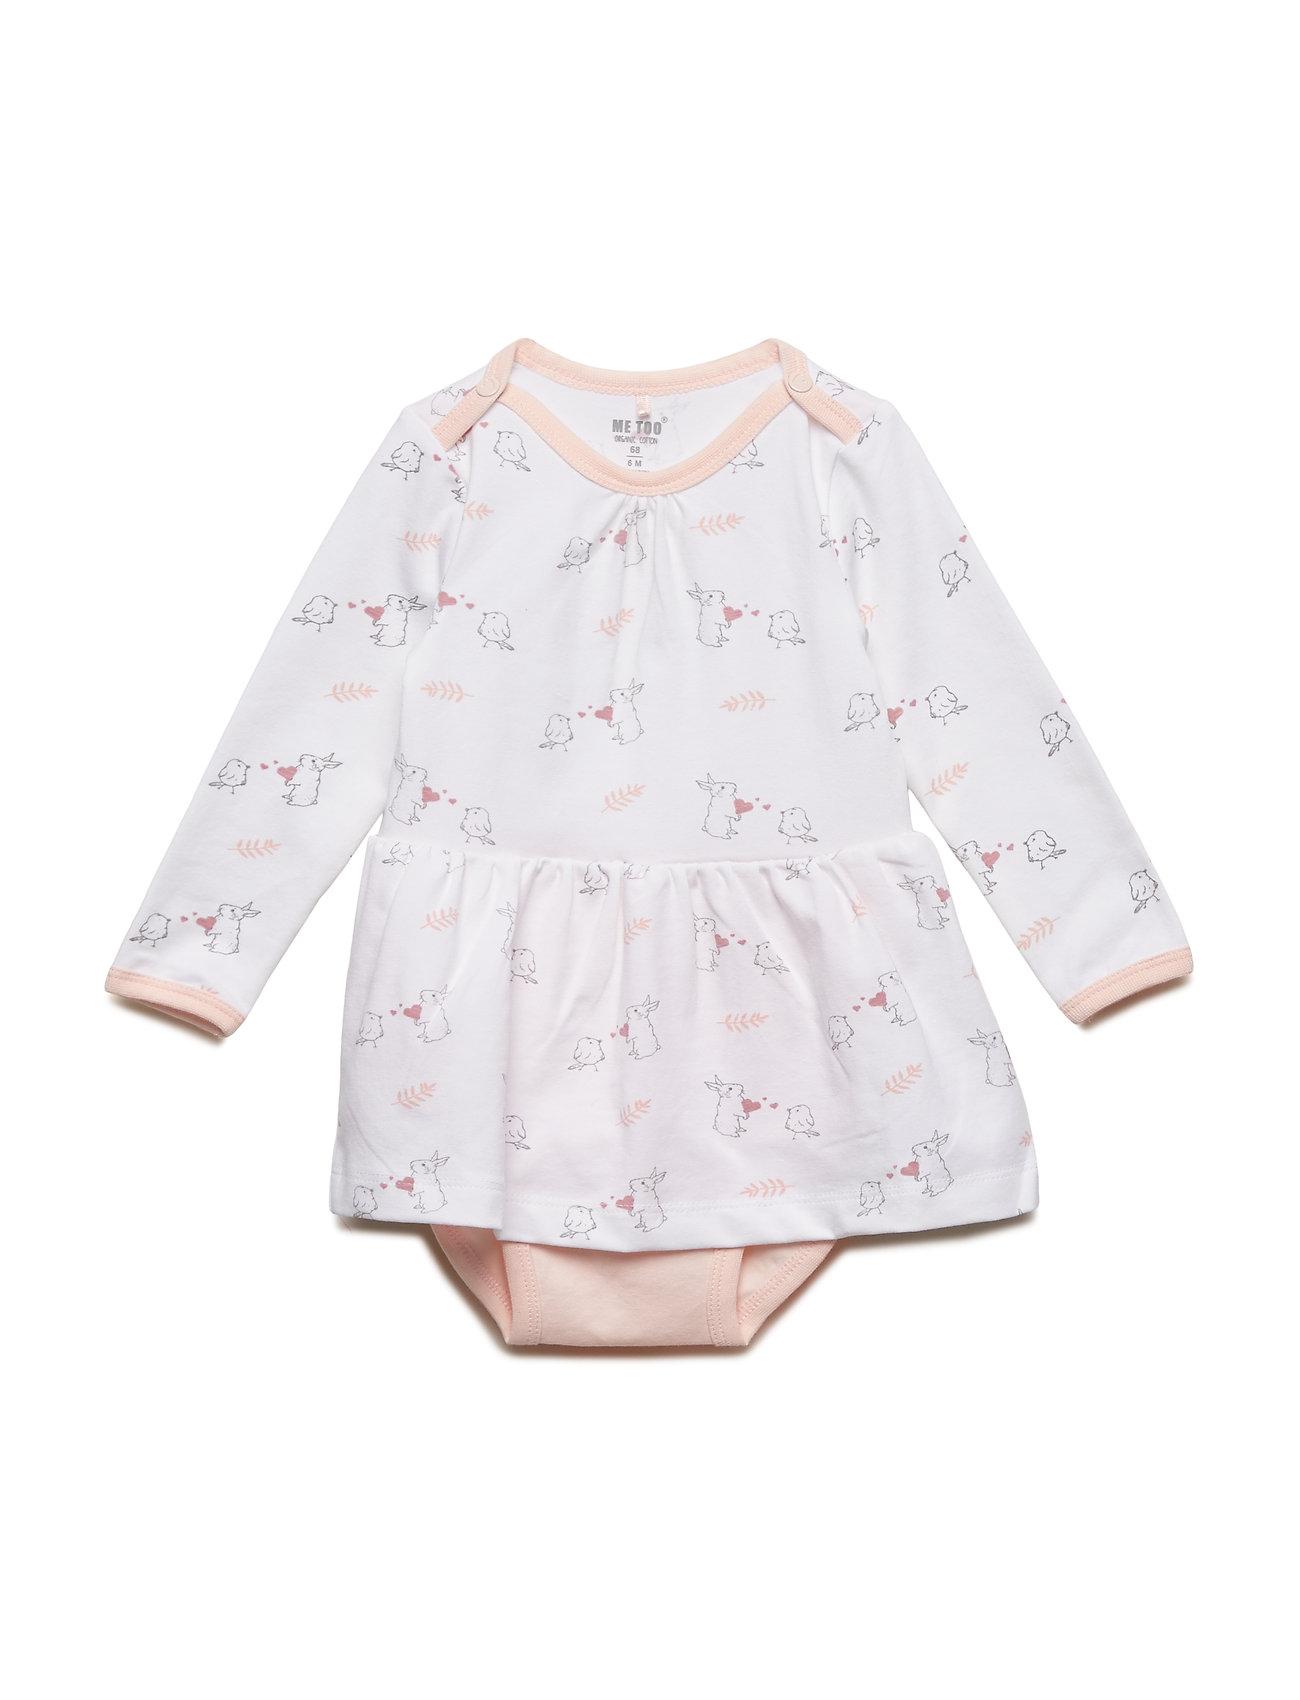 aca79867 Dress Ls Aop (Crystal Pink) (129.97 kr) - MeToo - | Boozt.com